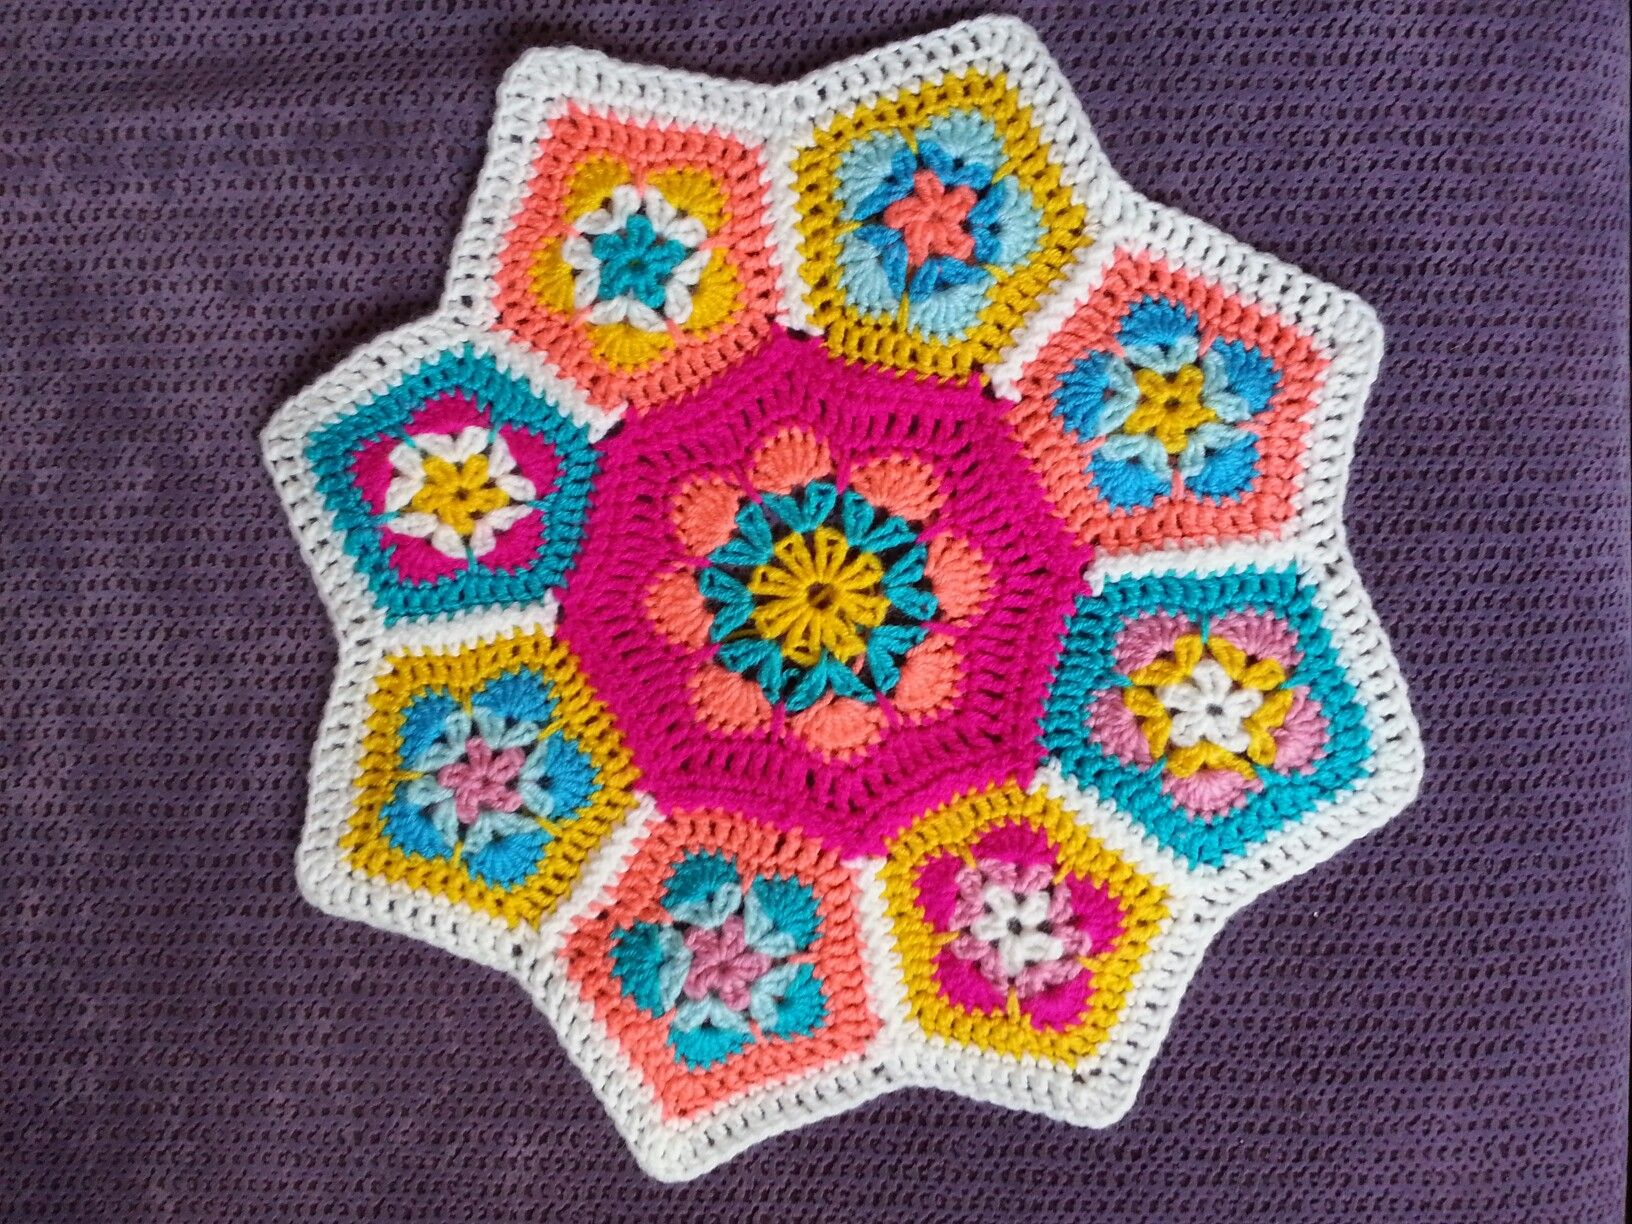 Pin de Samanta Colapetella en Tejido crochet   Pinterest